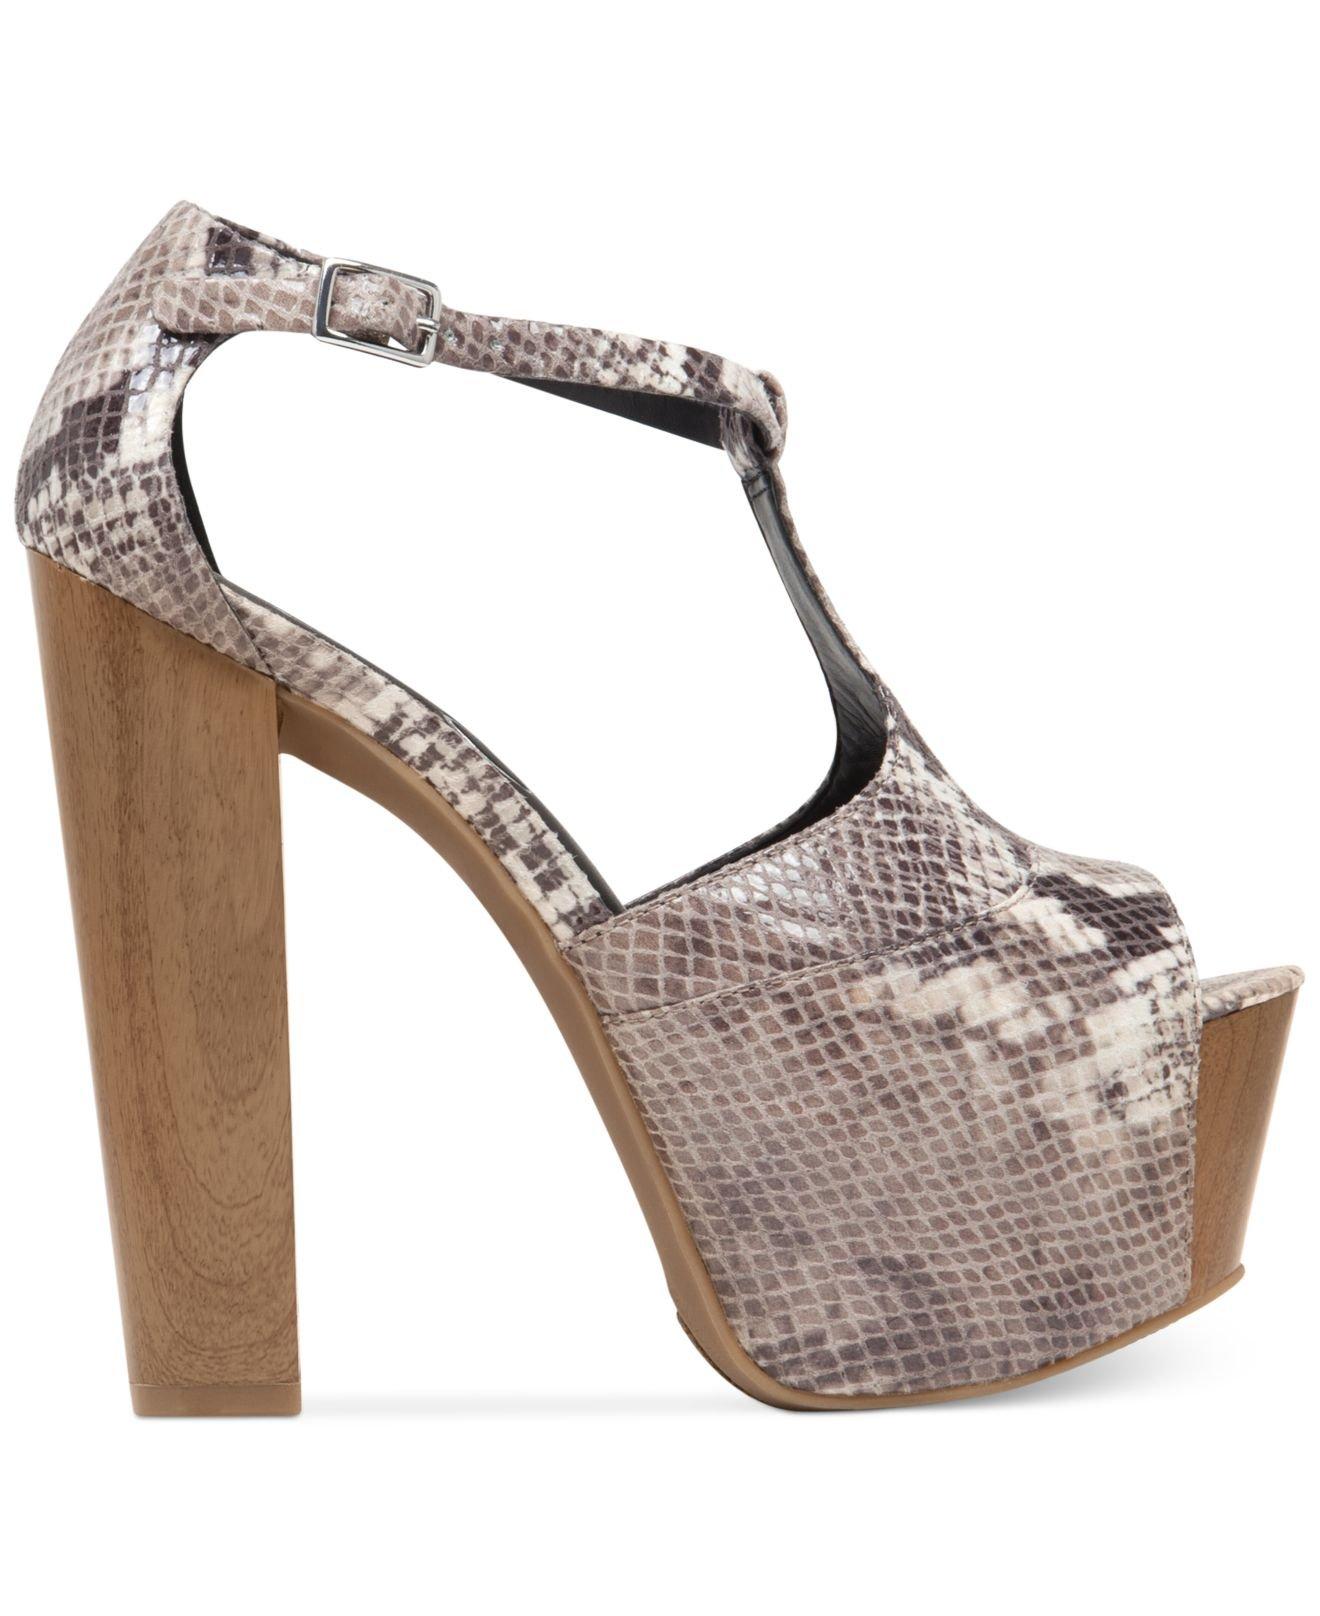 585261bada5 Jessica Simpson Brown Dany T-Strap Platform Sandals